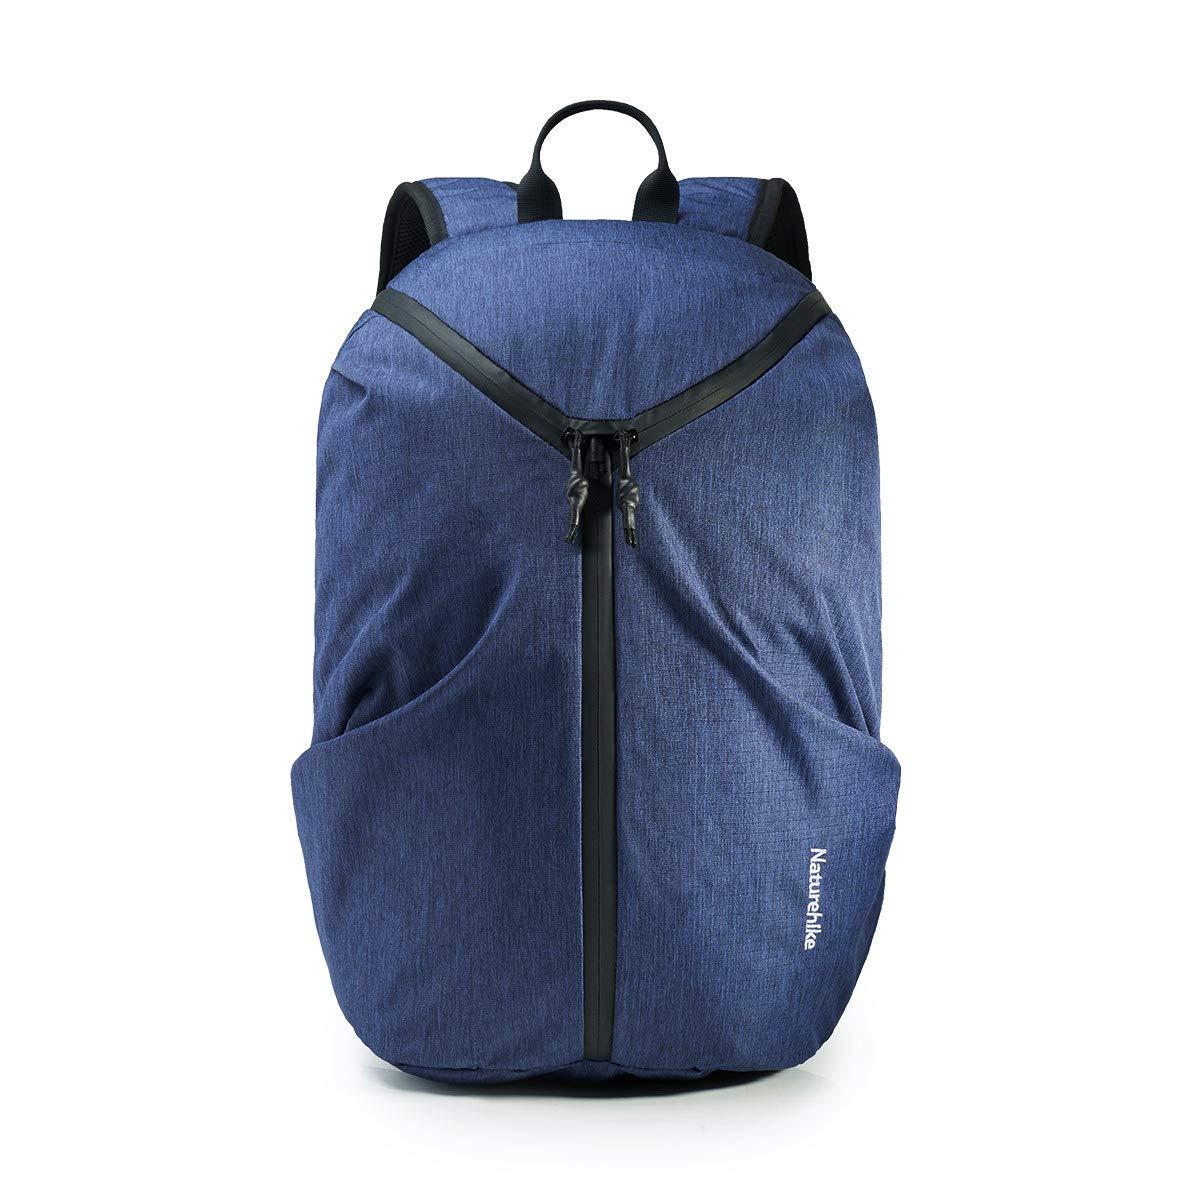 Naturehike Travel Laptop Backpack, Lightweight Hiking Daypack Fit 15.6 Inch Laptop with USB Charging Port,Large Backpack for Women & Men (25L Navy Blue)